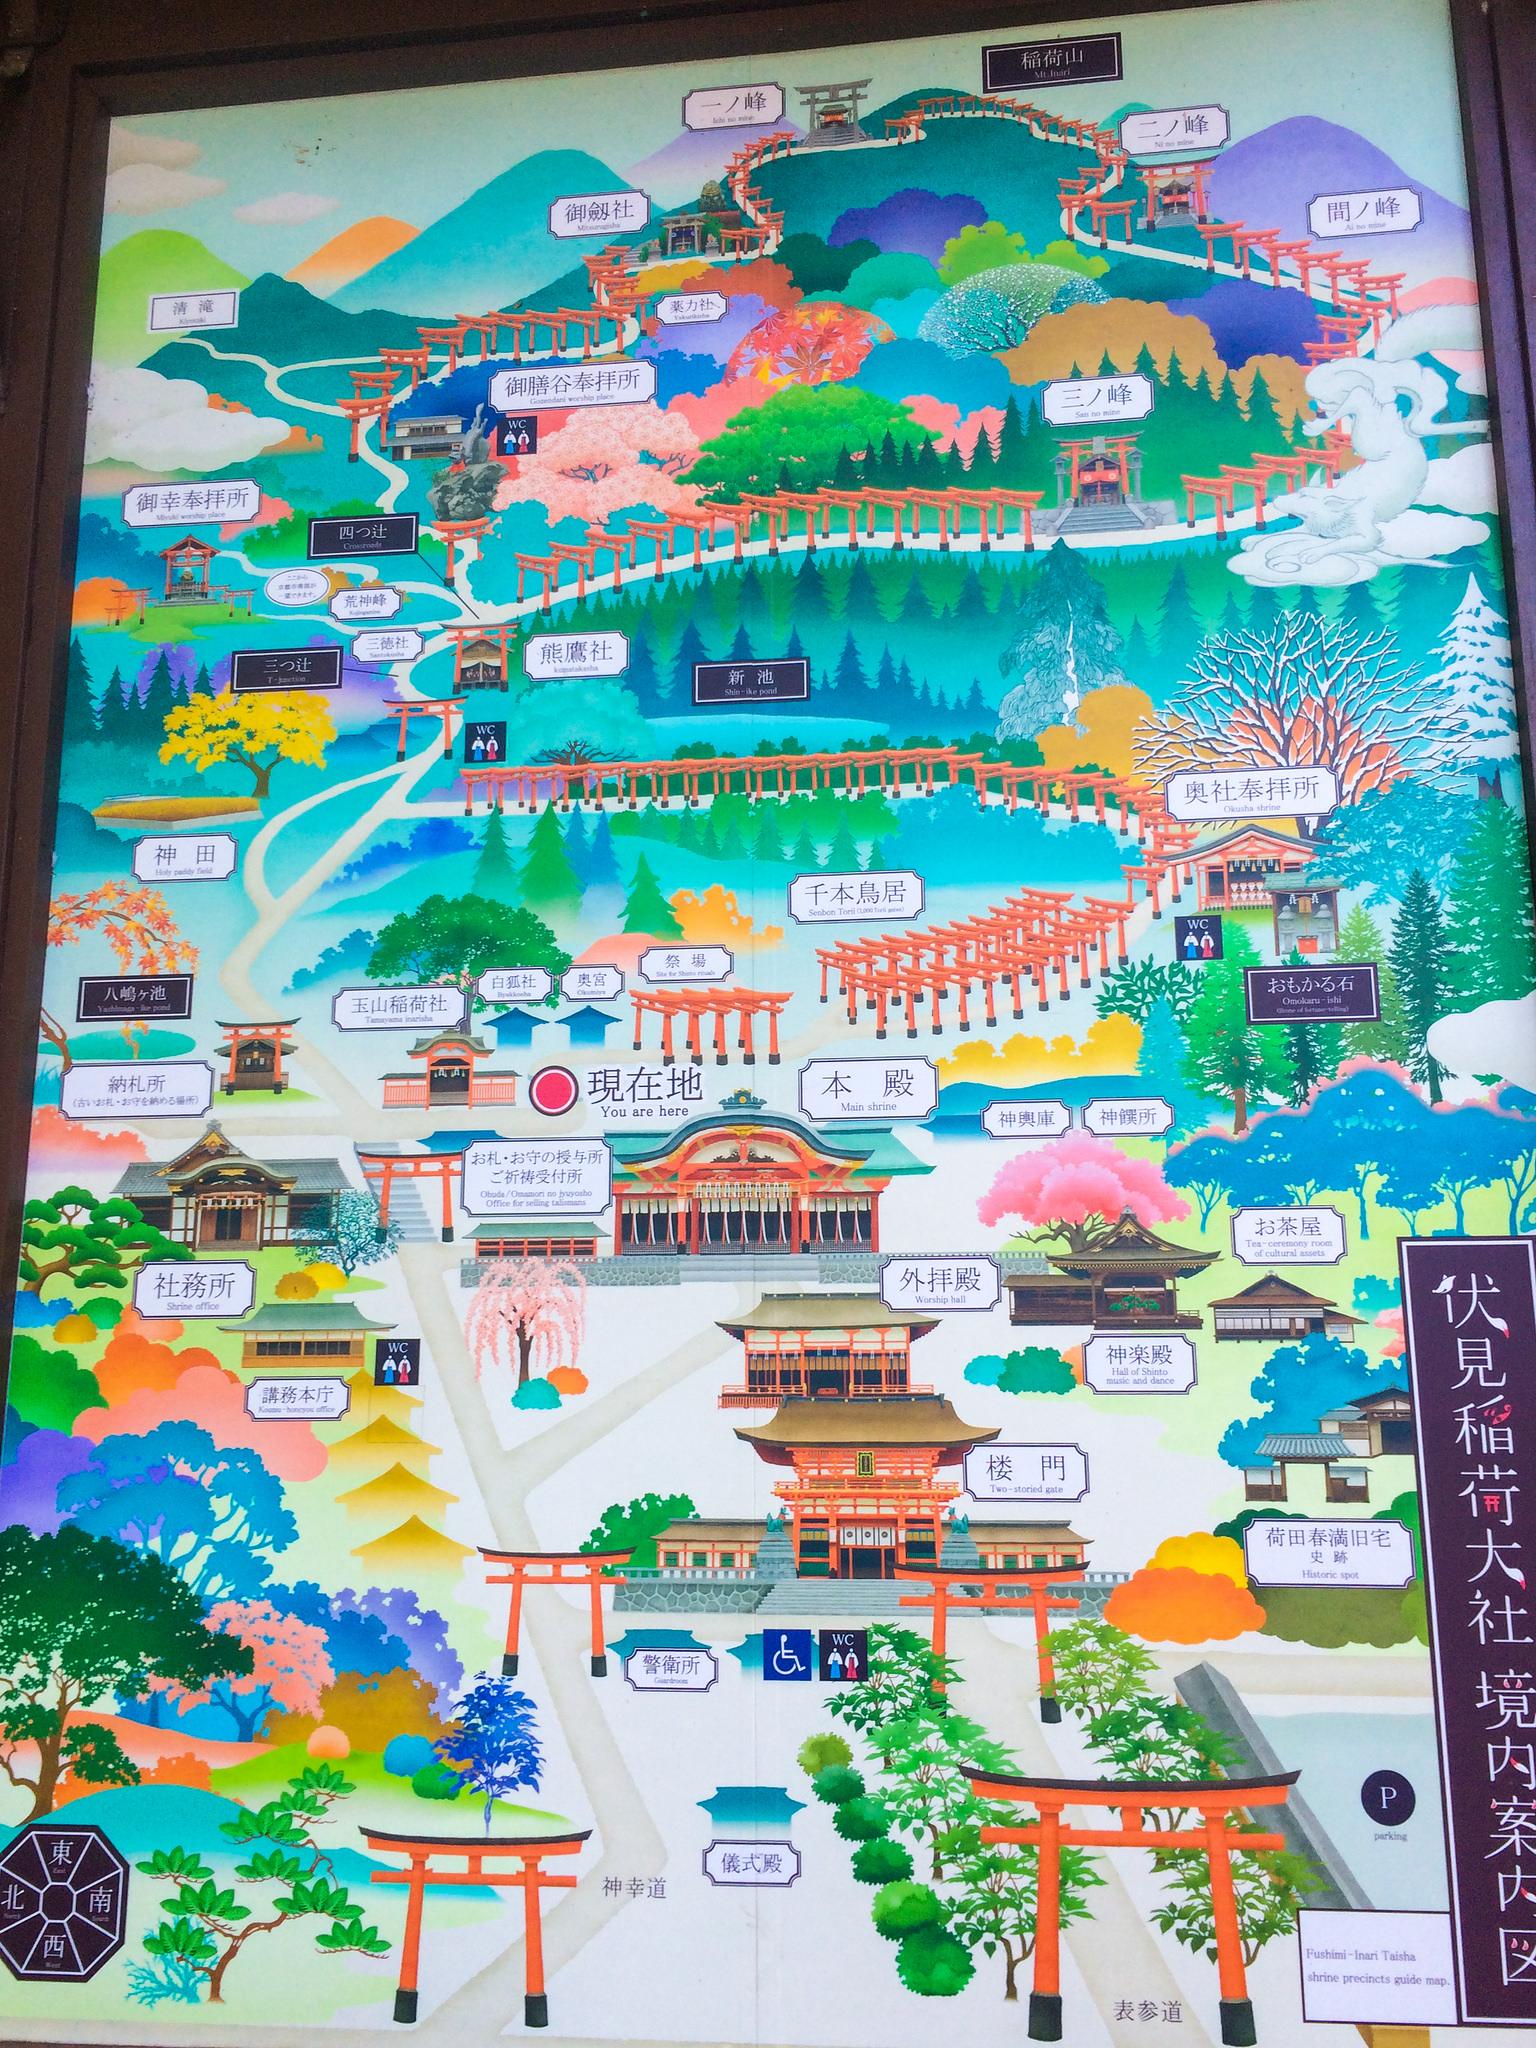 30328835016_4ed3fe7c05_k.jpgThe Ultimate Walking Tour of Kyoto's Incredible Fushimi Inari Shrine's 10,000 torii gates